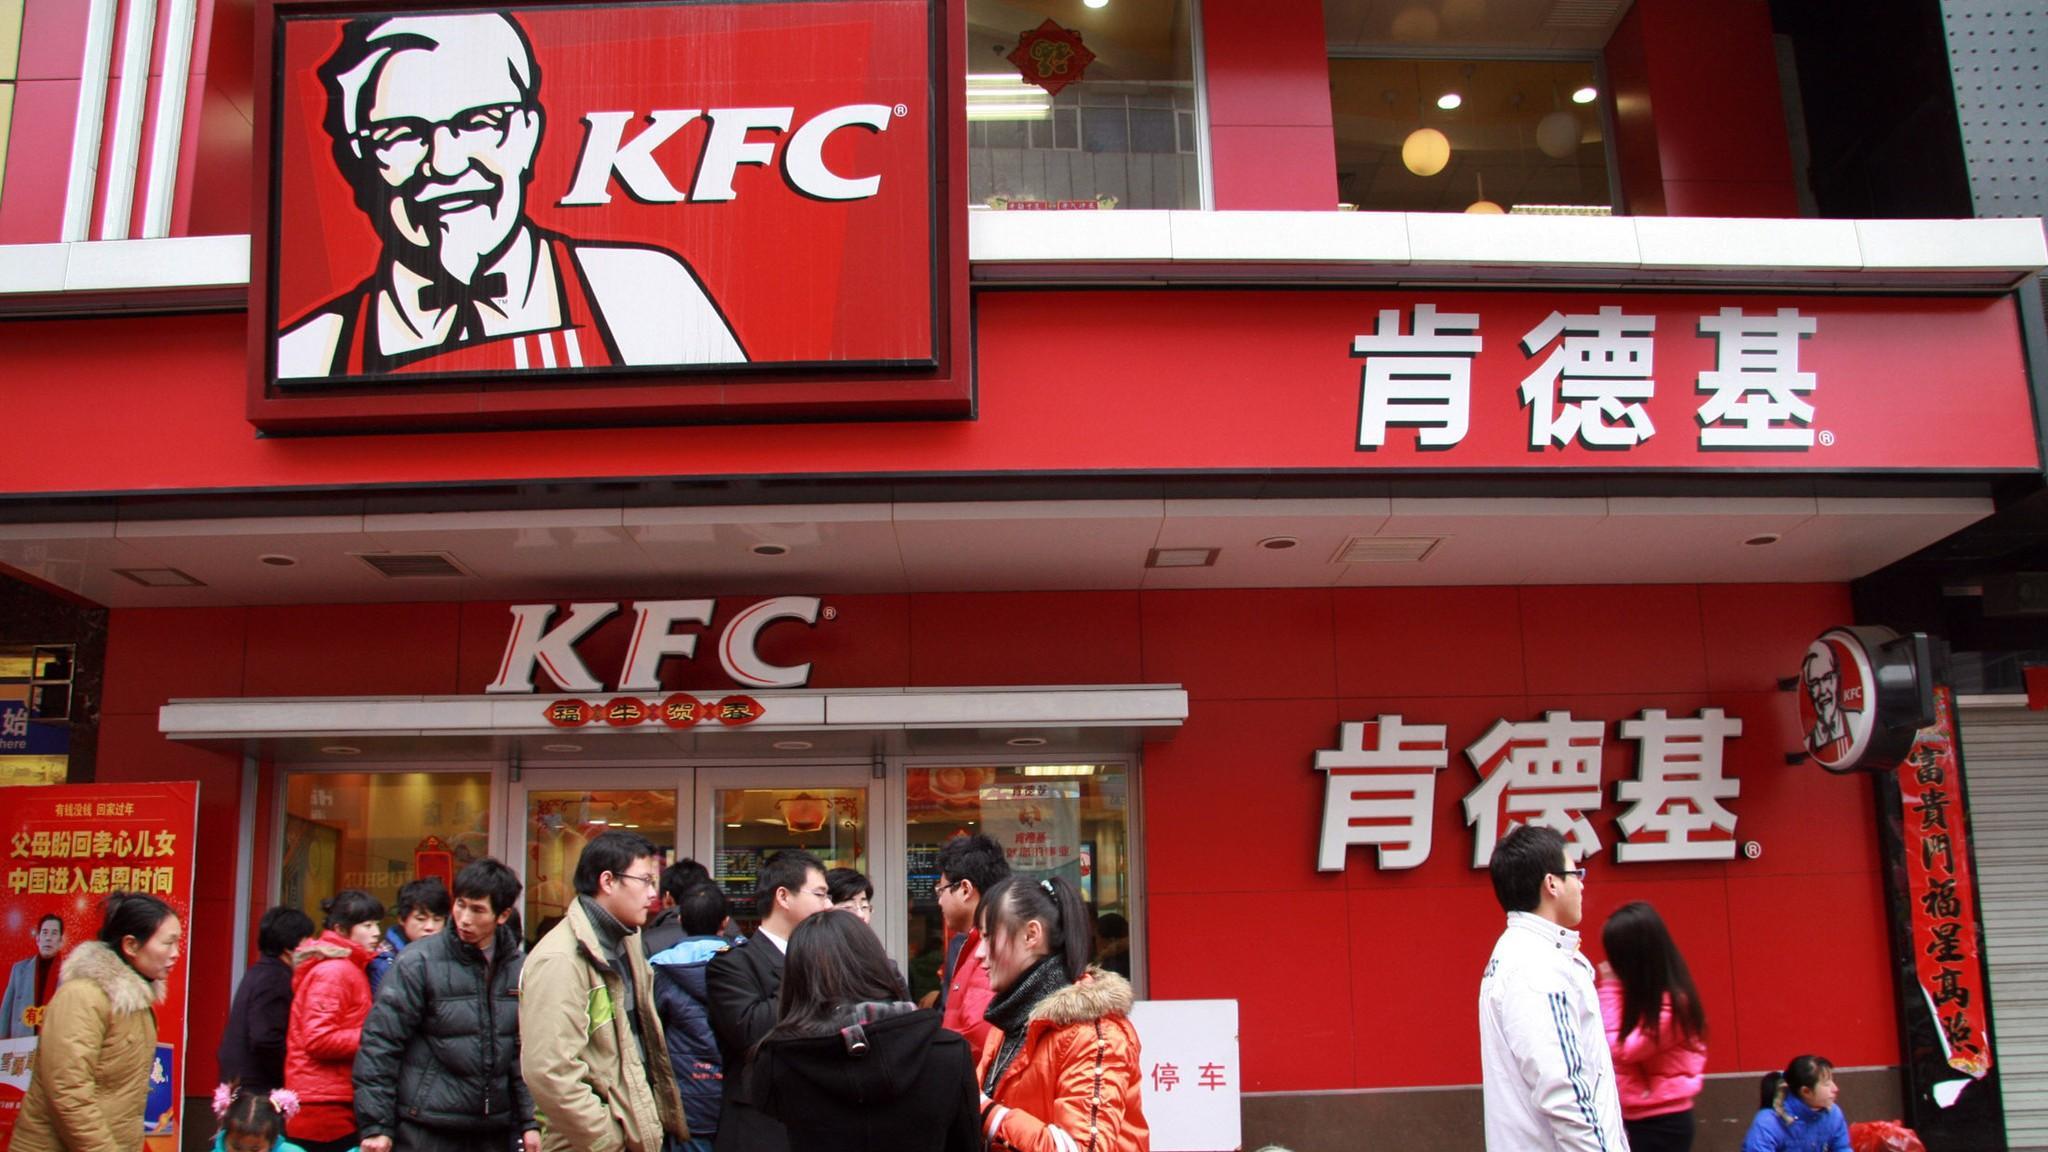 la-fi-mo-kfc-chicken-china-yum-20130205-001-e1405970496404